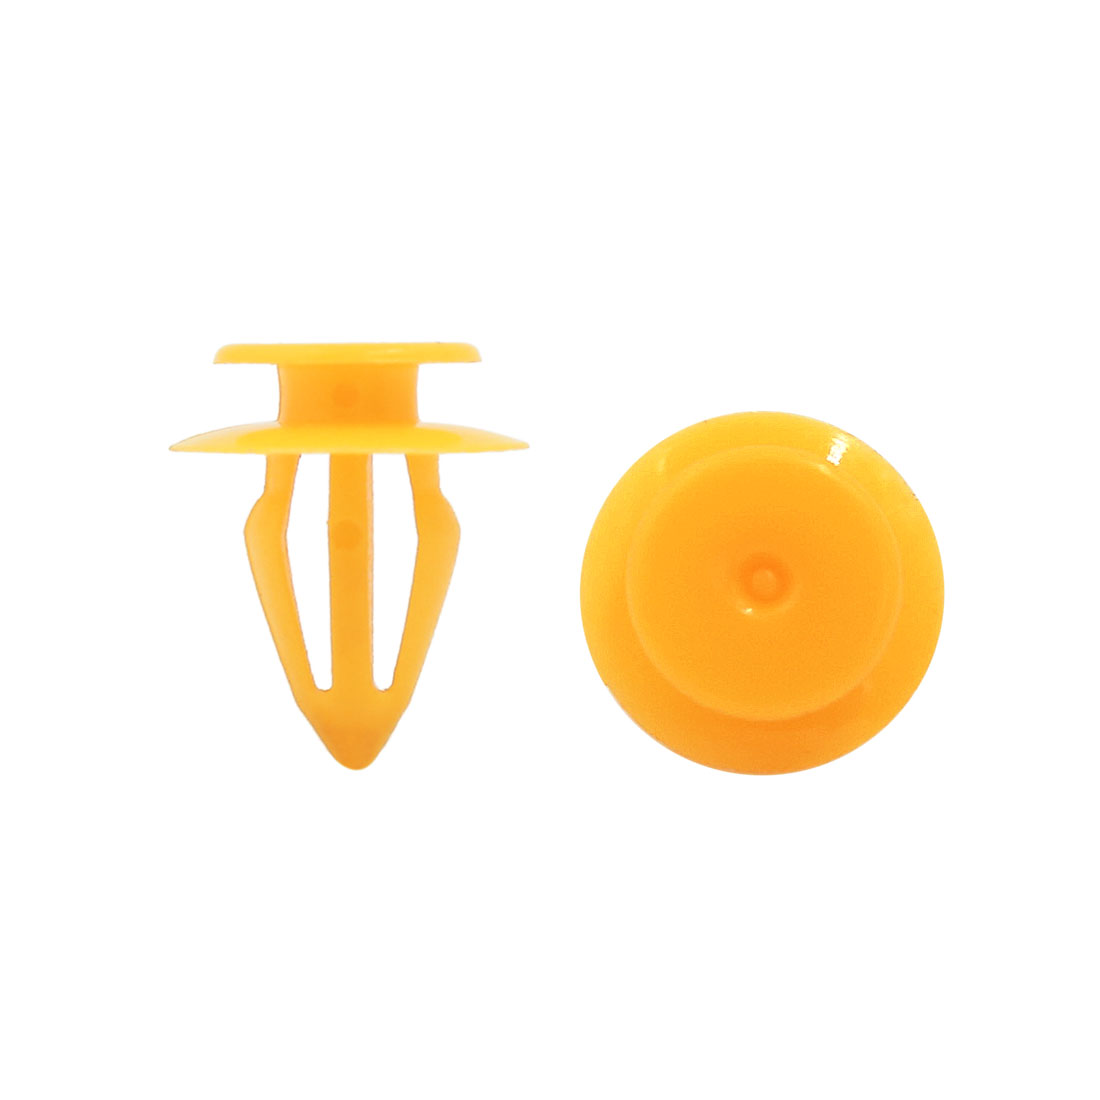 100Pcs Universal Yellow Plastic Rivets Splash Guard Fastener Clips 10mm for Car